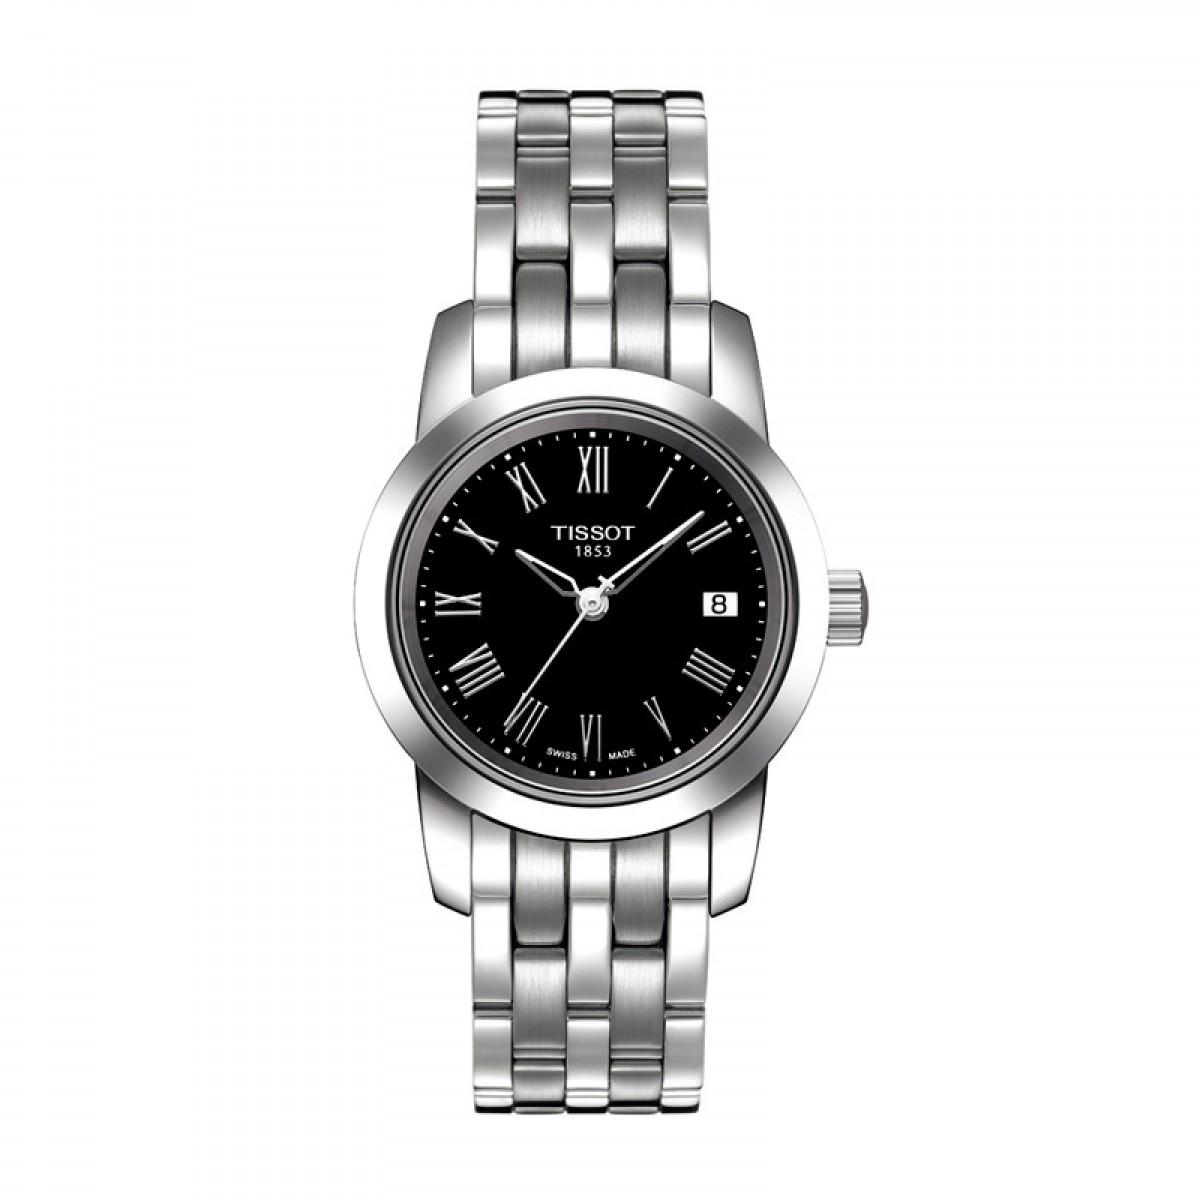 Часовник Tissot T033.210.11.053.00